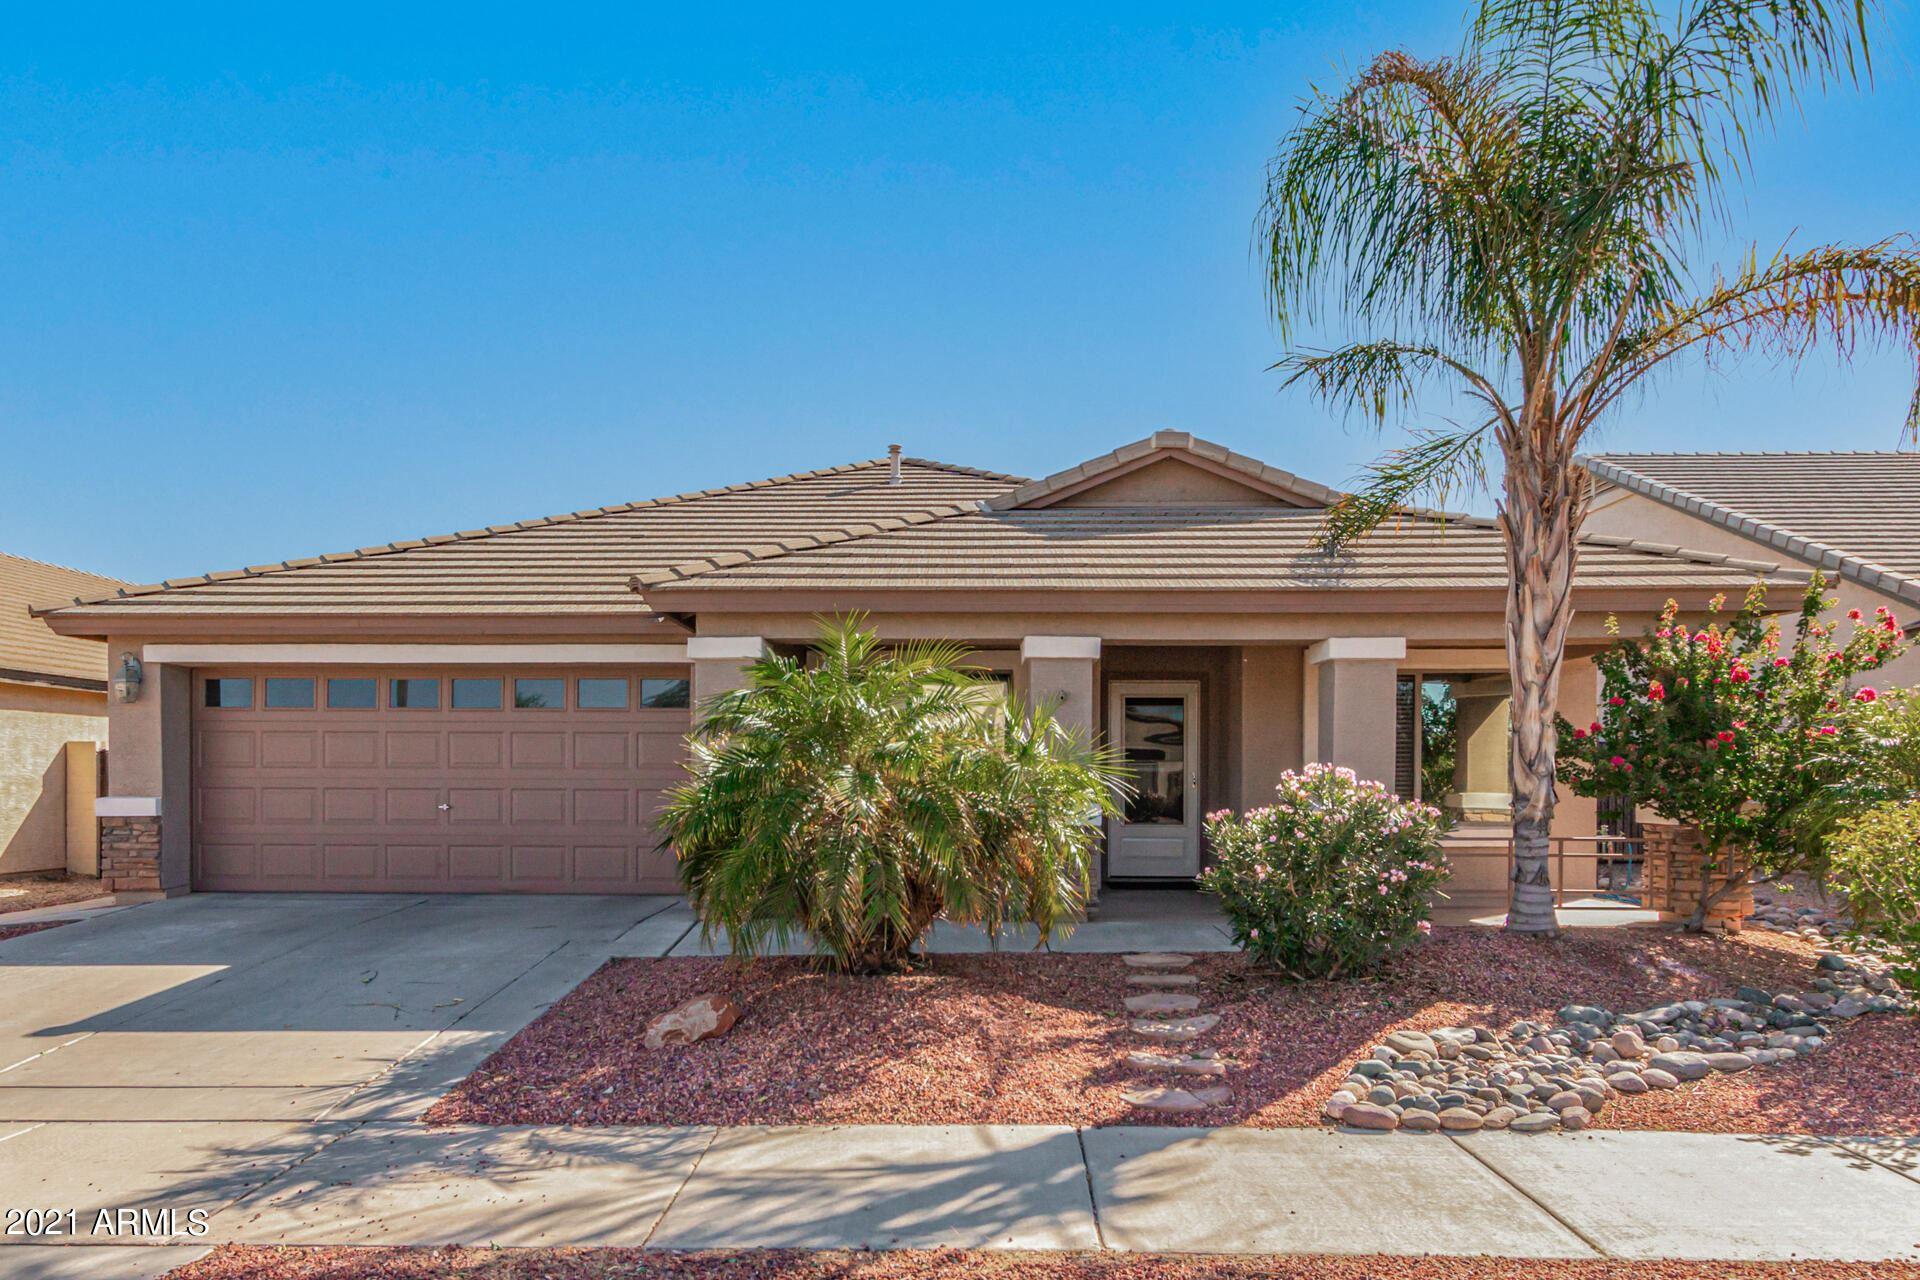 Photo of 17867 W EUGENE Terrace, Surprise, AZ 85388 (MLS # 6307333)